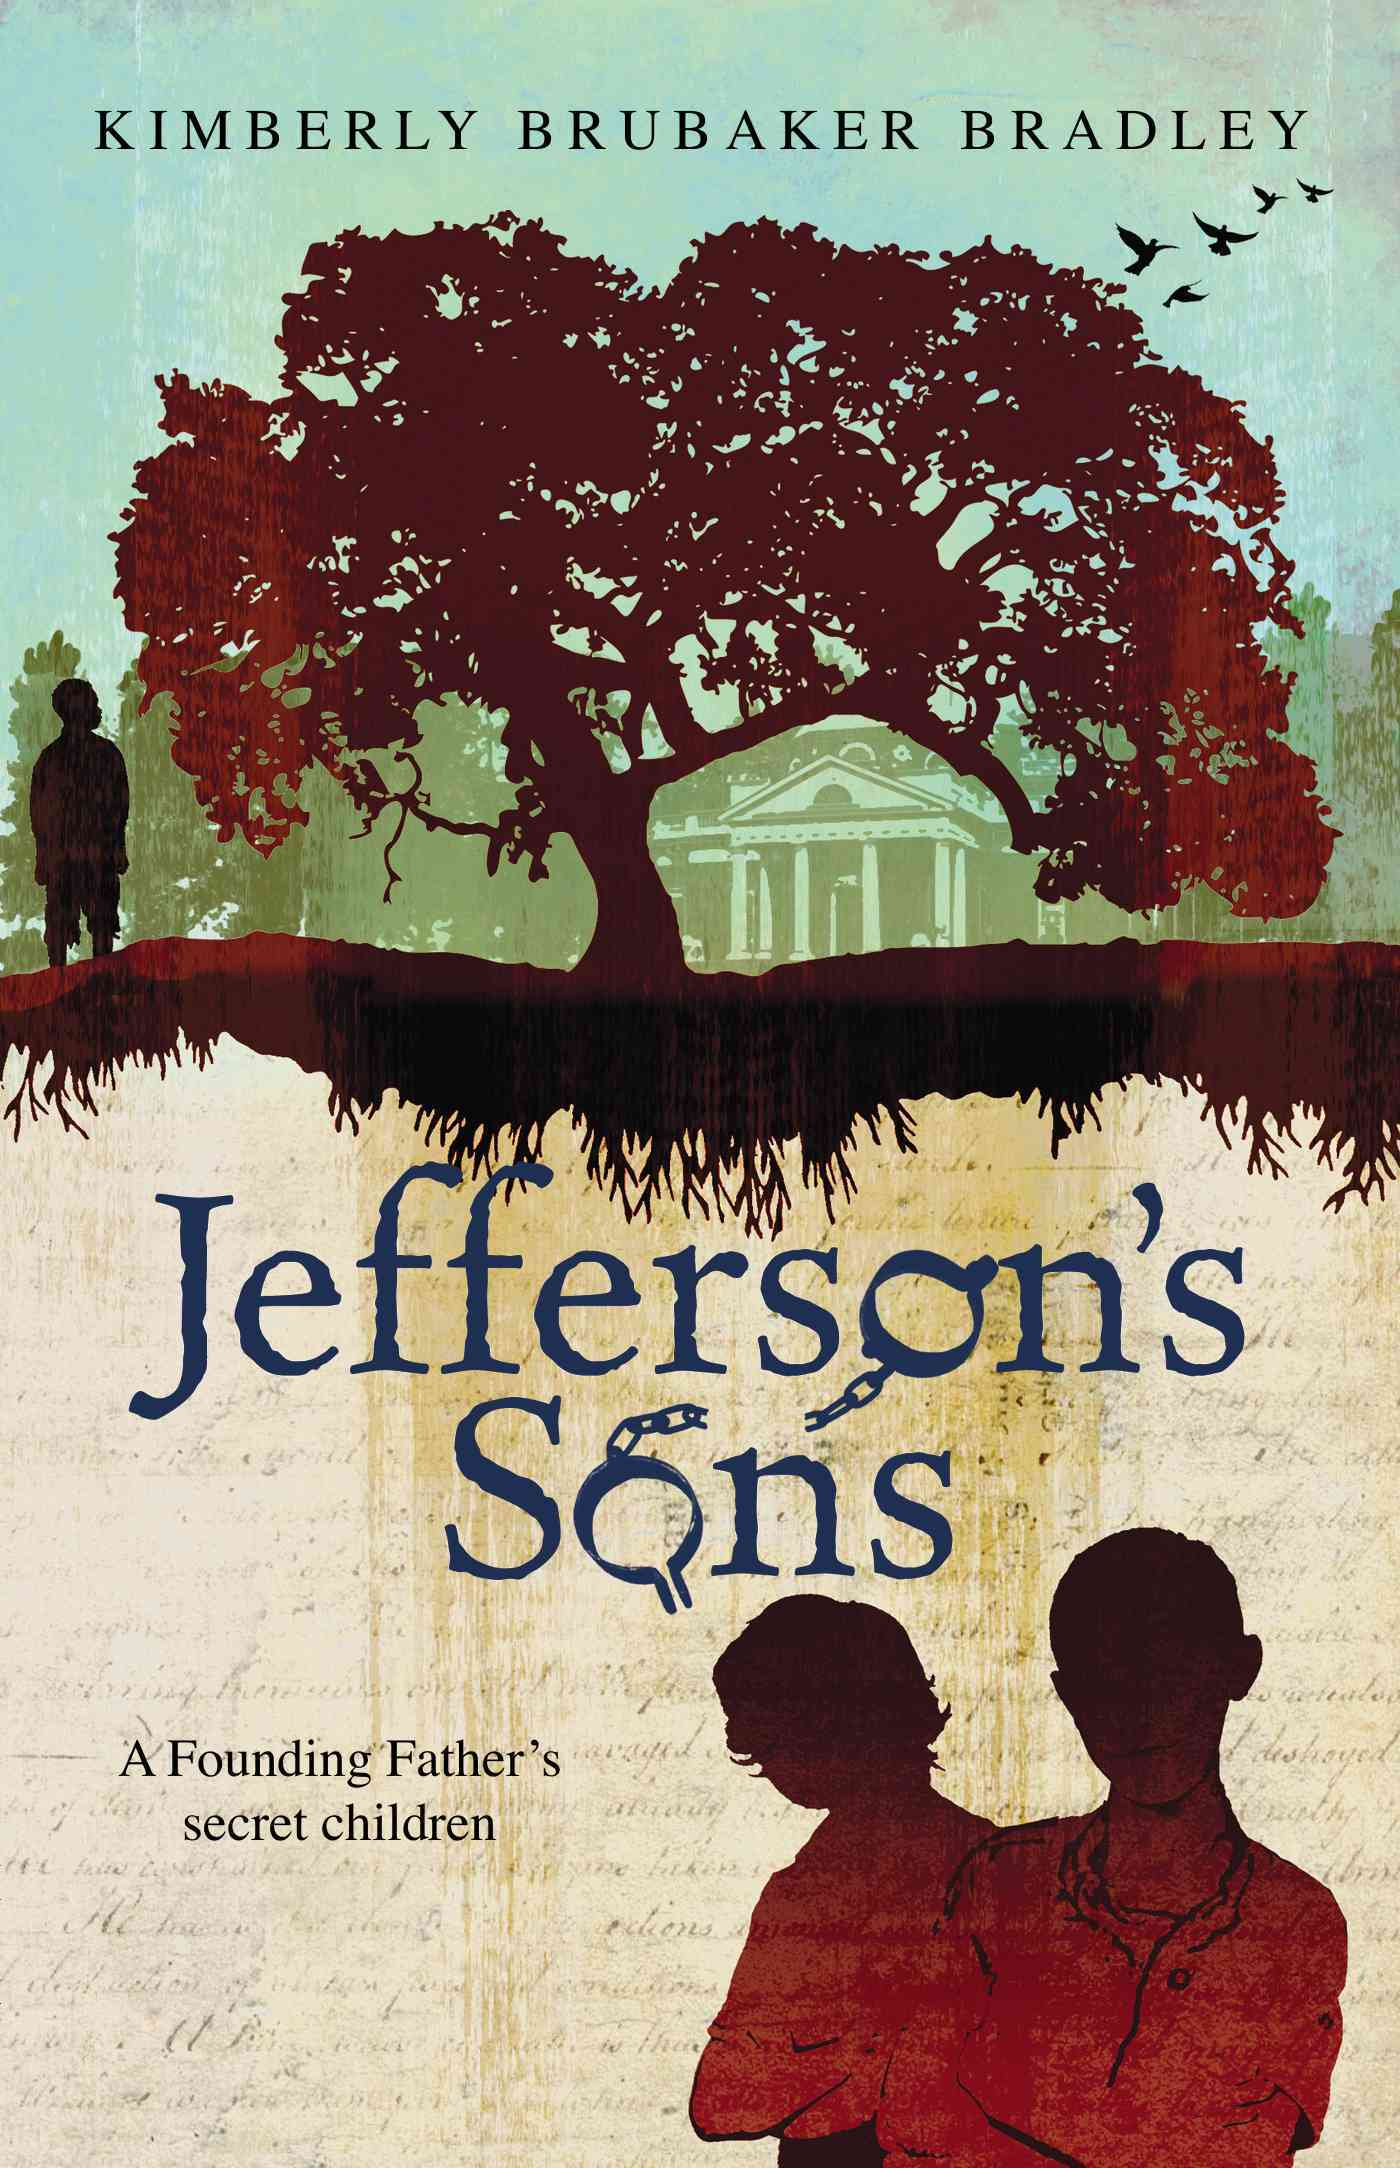 Jefferson's Sons By Bradley, Kimberly Brubaker